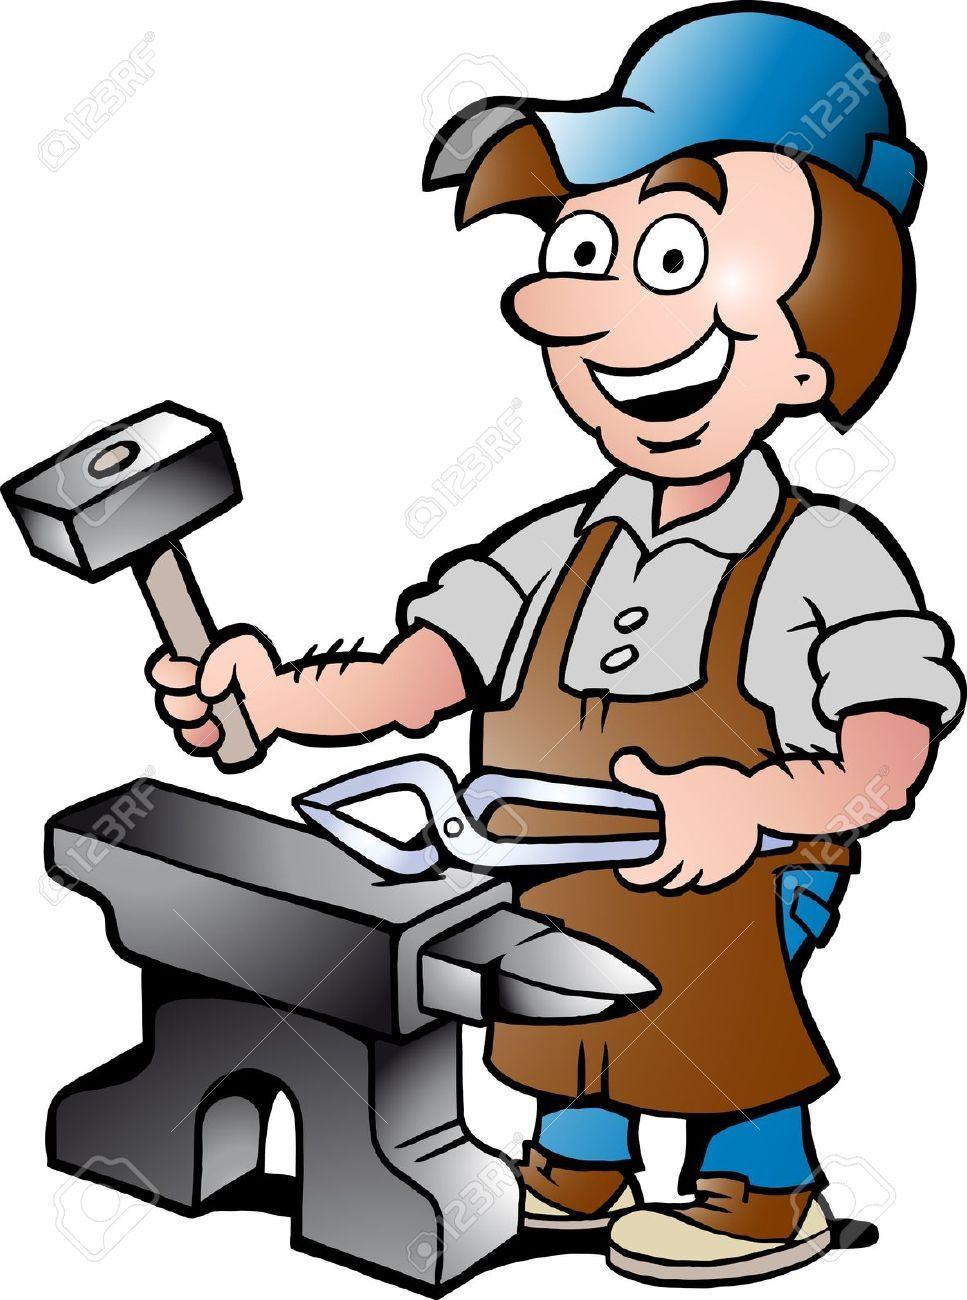 medium resolution of 967x1300 17901074 hand drawn vector illustration of an happy blacksmith